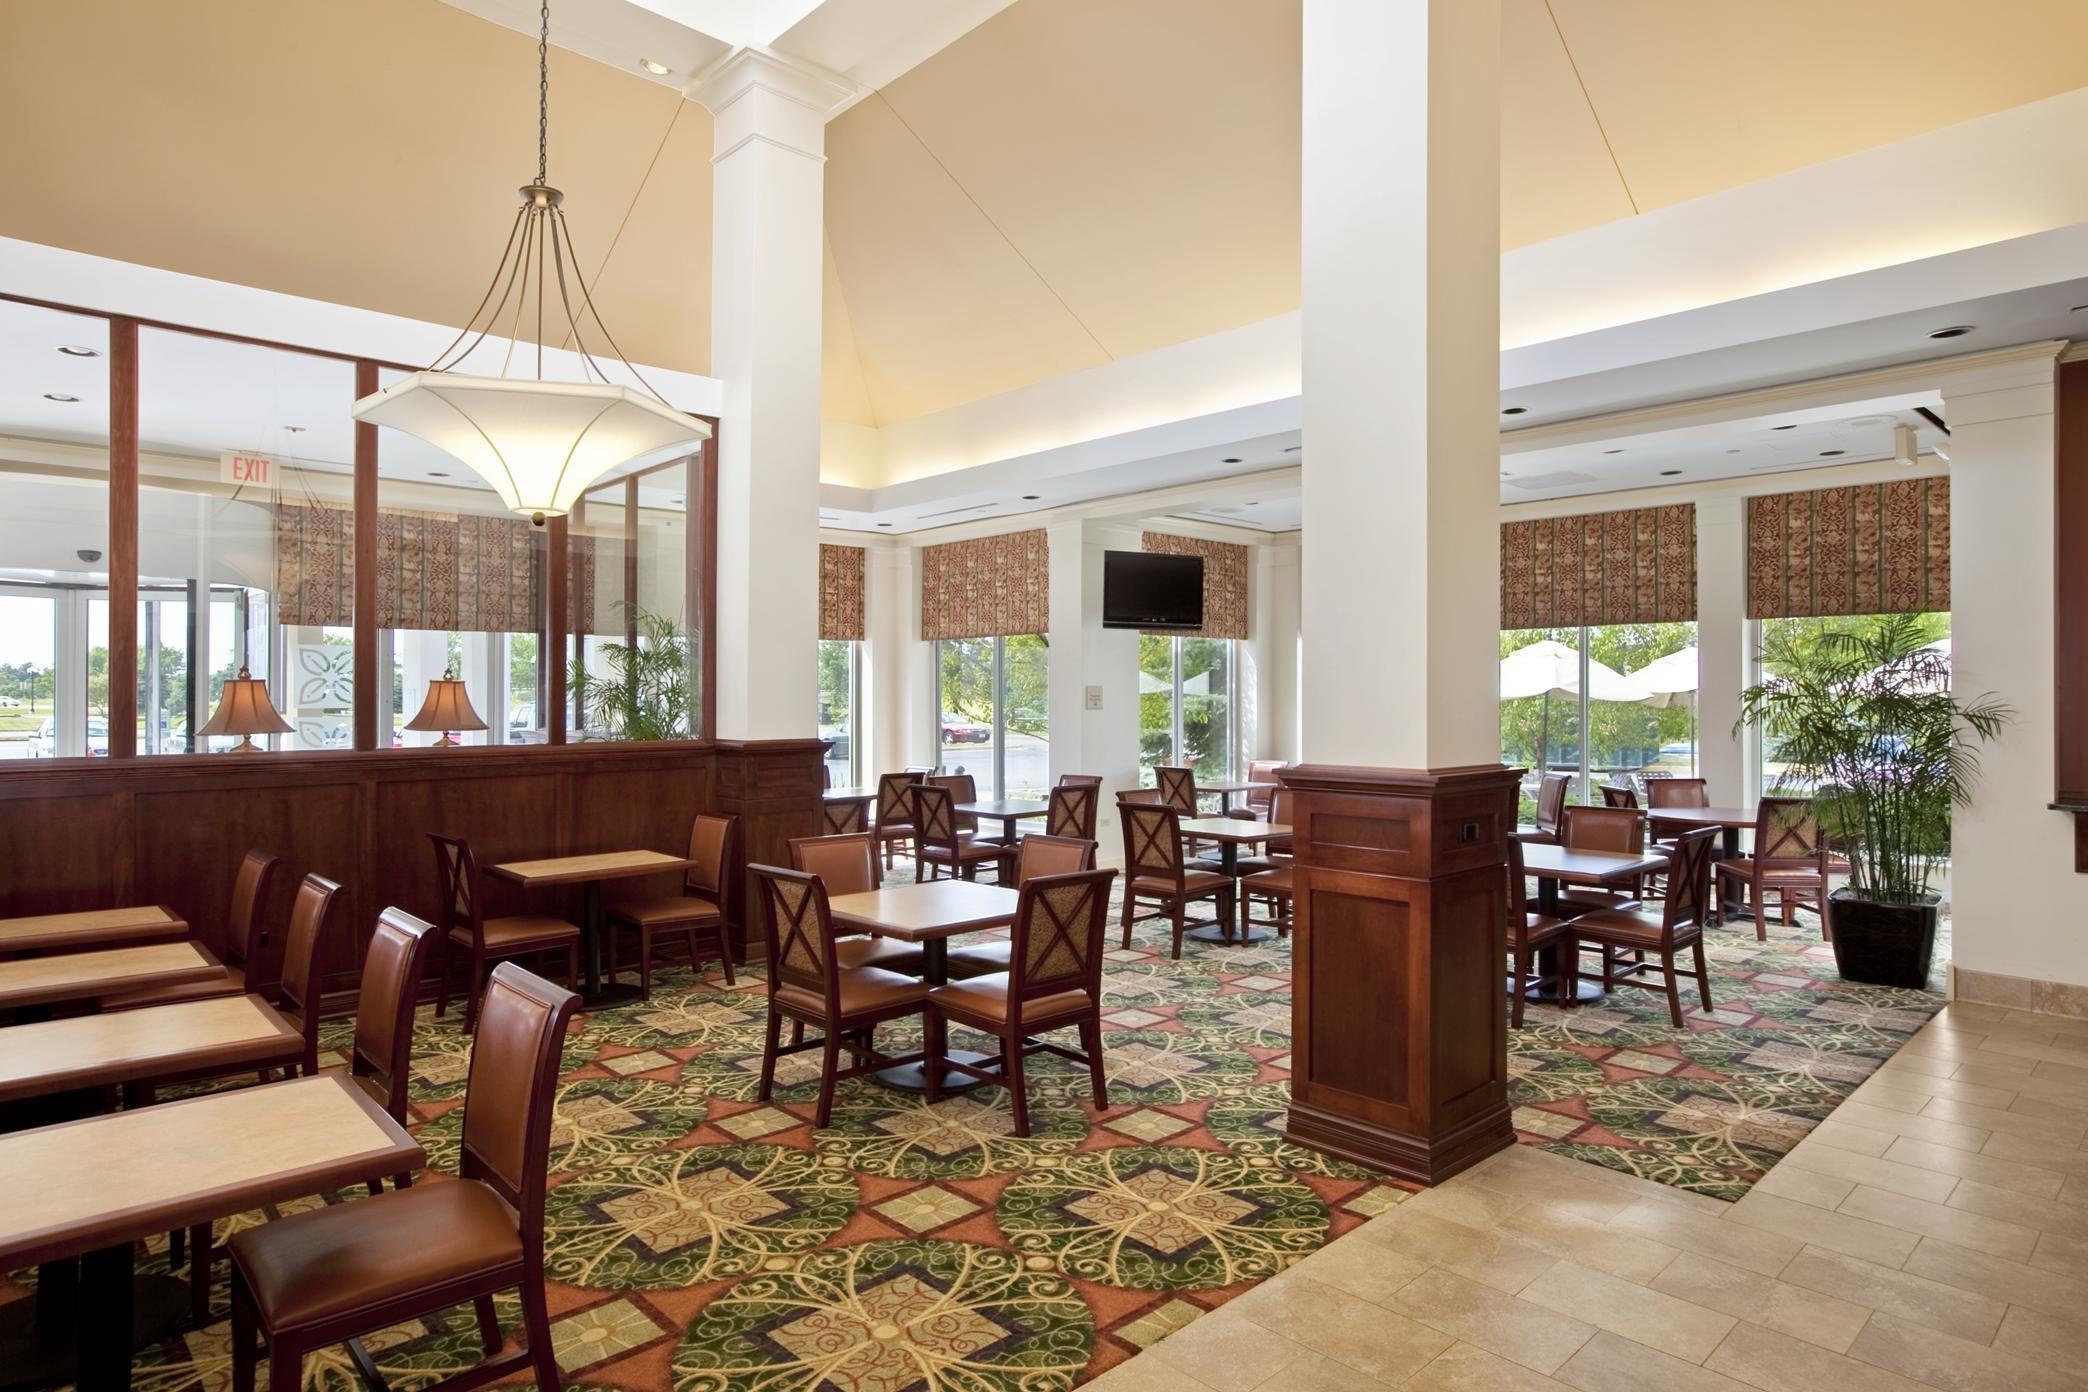 Hilton Garden Inn Chicago/Oakbrook Terrace image 6